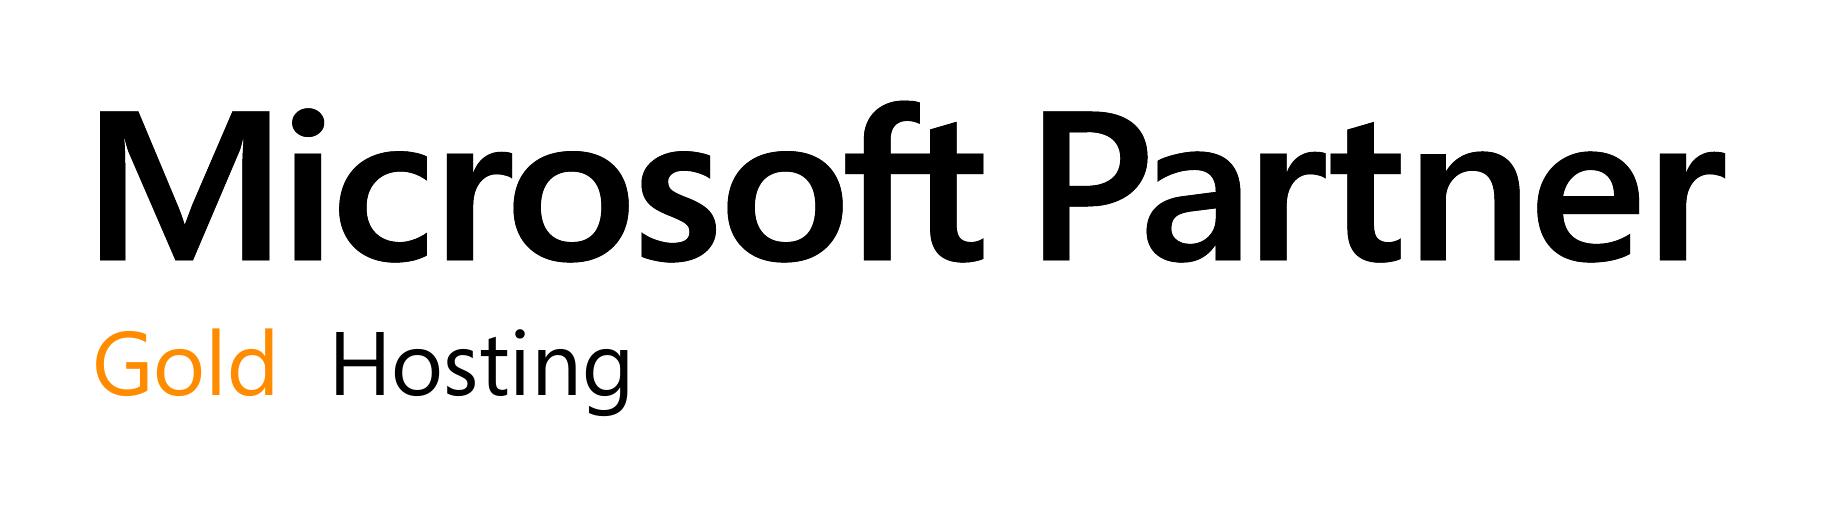 microsoft gold partner - hosting competency